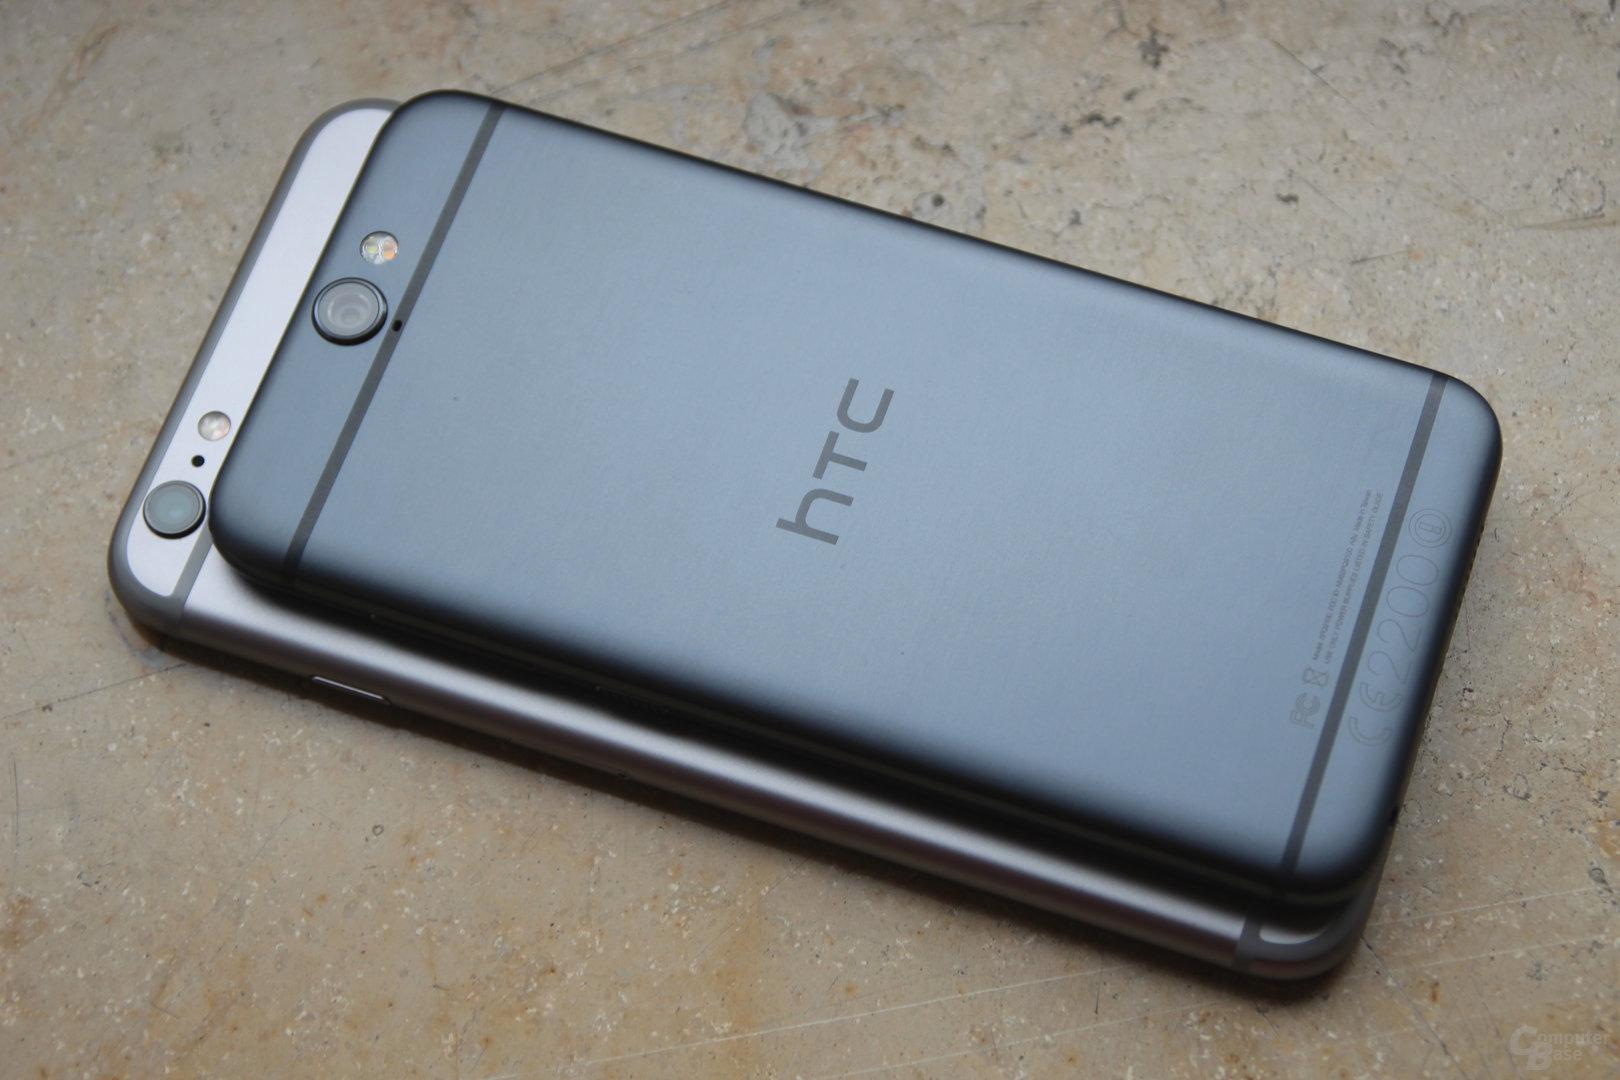 HTC One A9 auf Apple iPhone 6s Plus